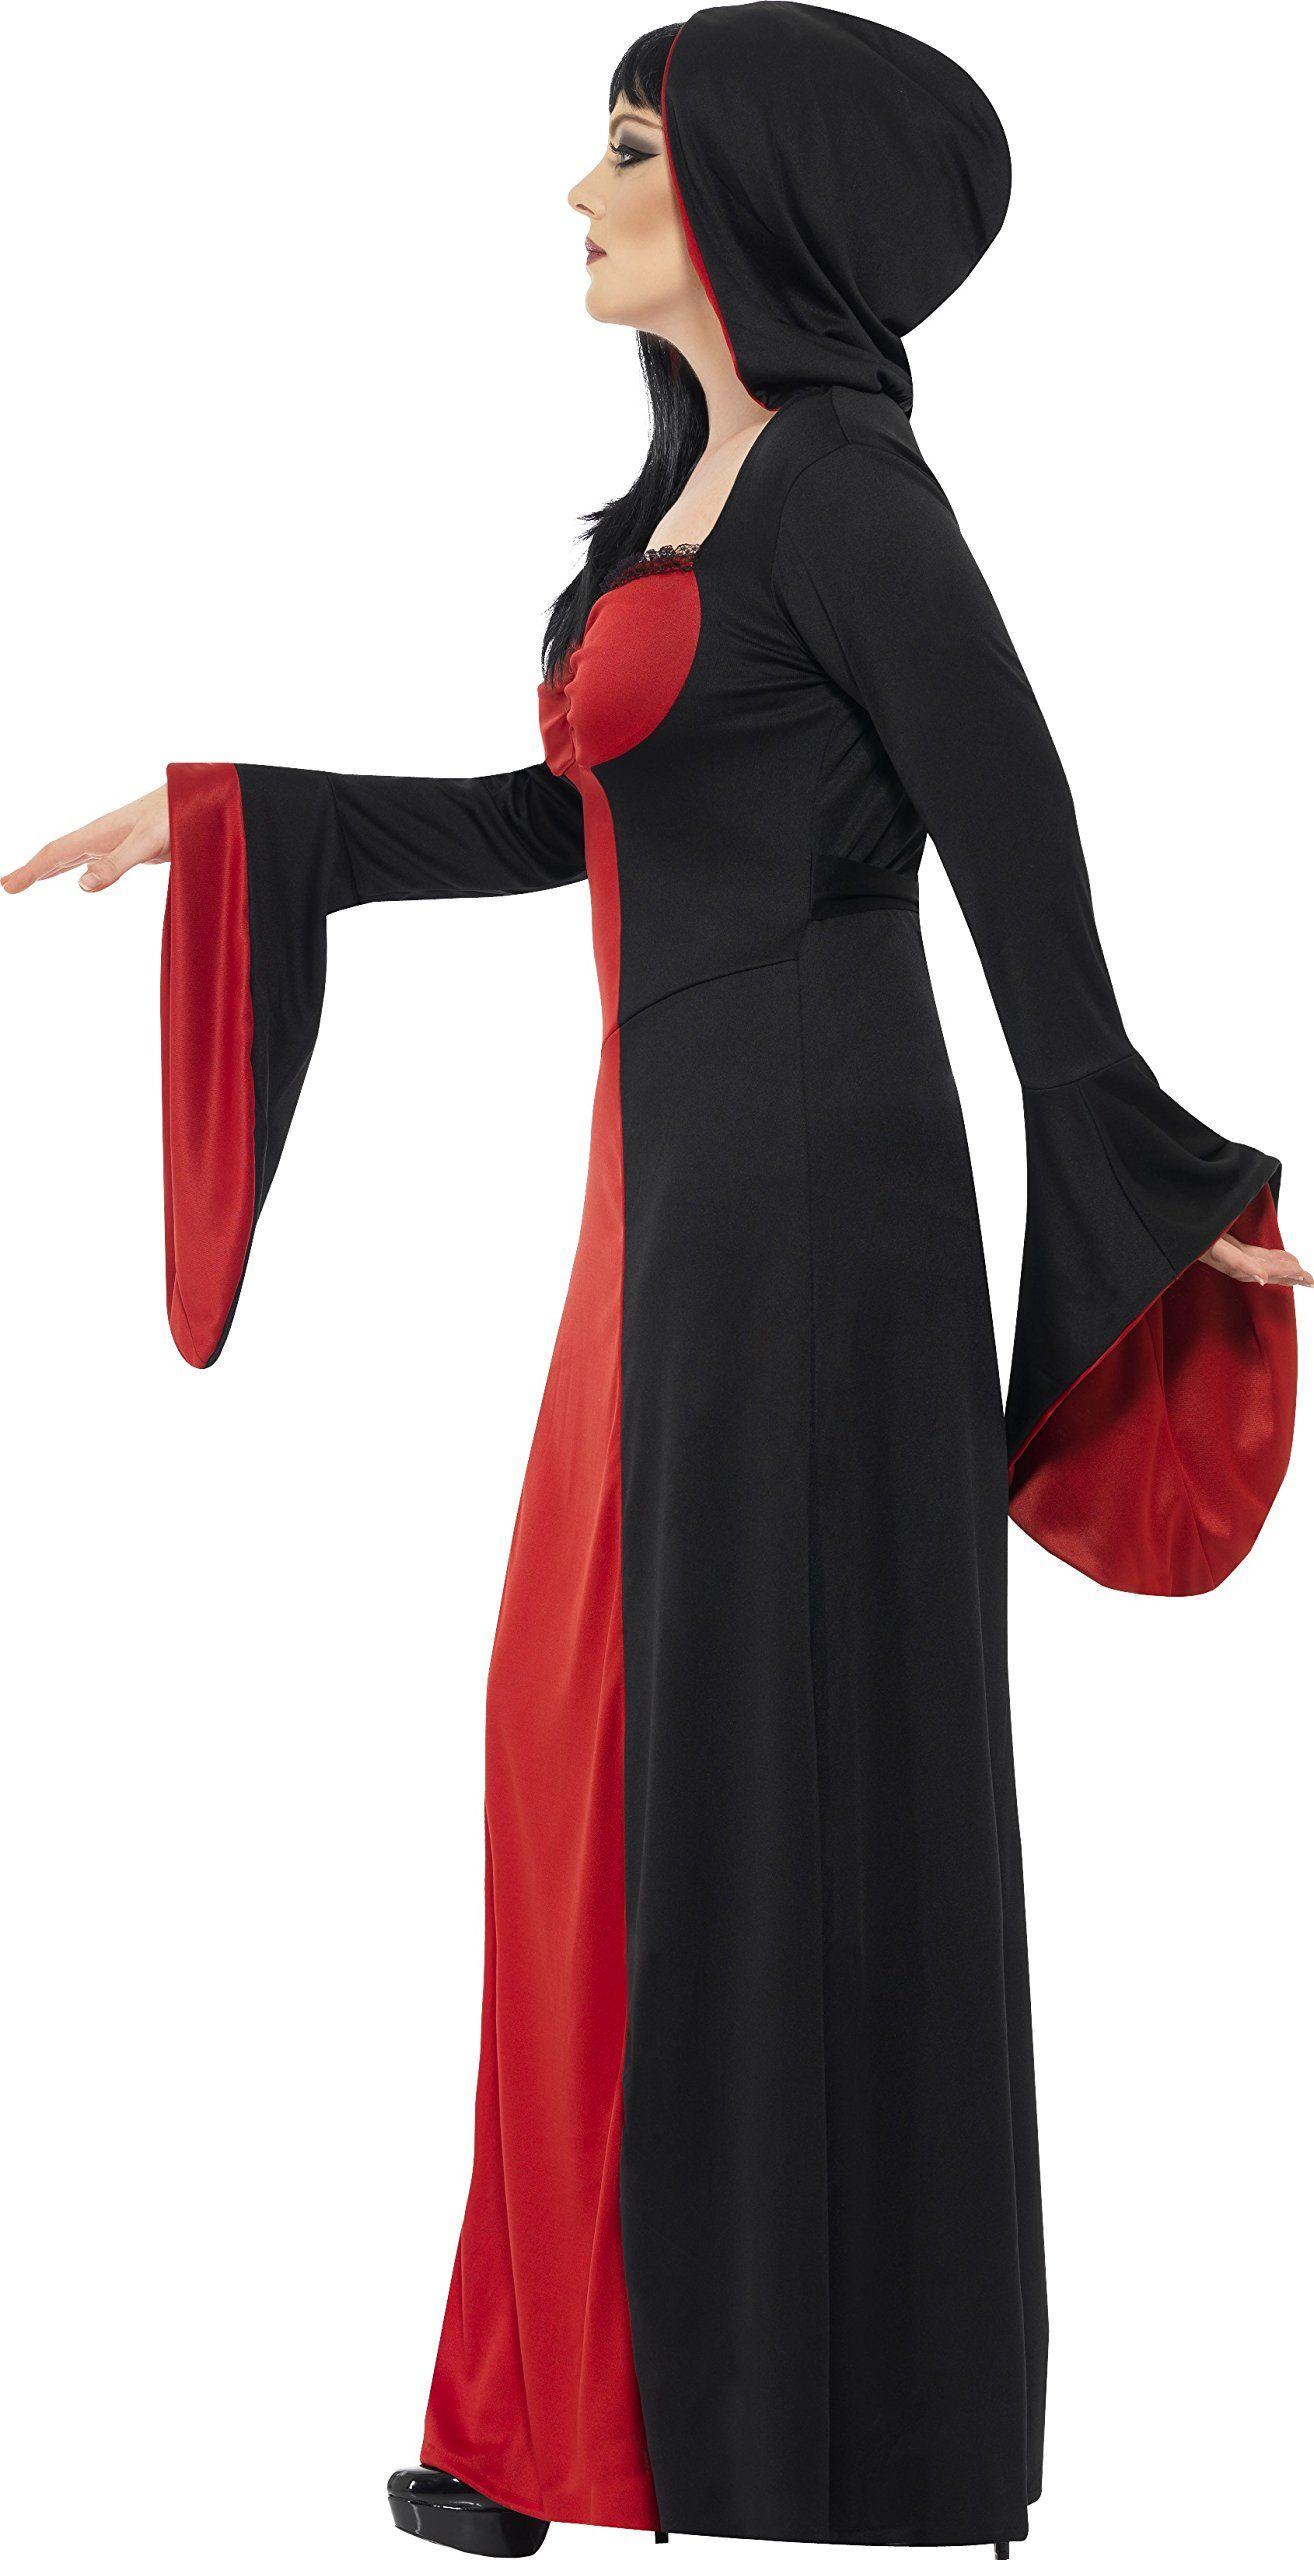 804dcc283 Smiffys Womens Dark Temptress Costume Dress and Hood Legends of Evil Halloween  Plus Size 2224 40077